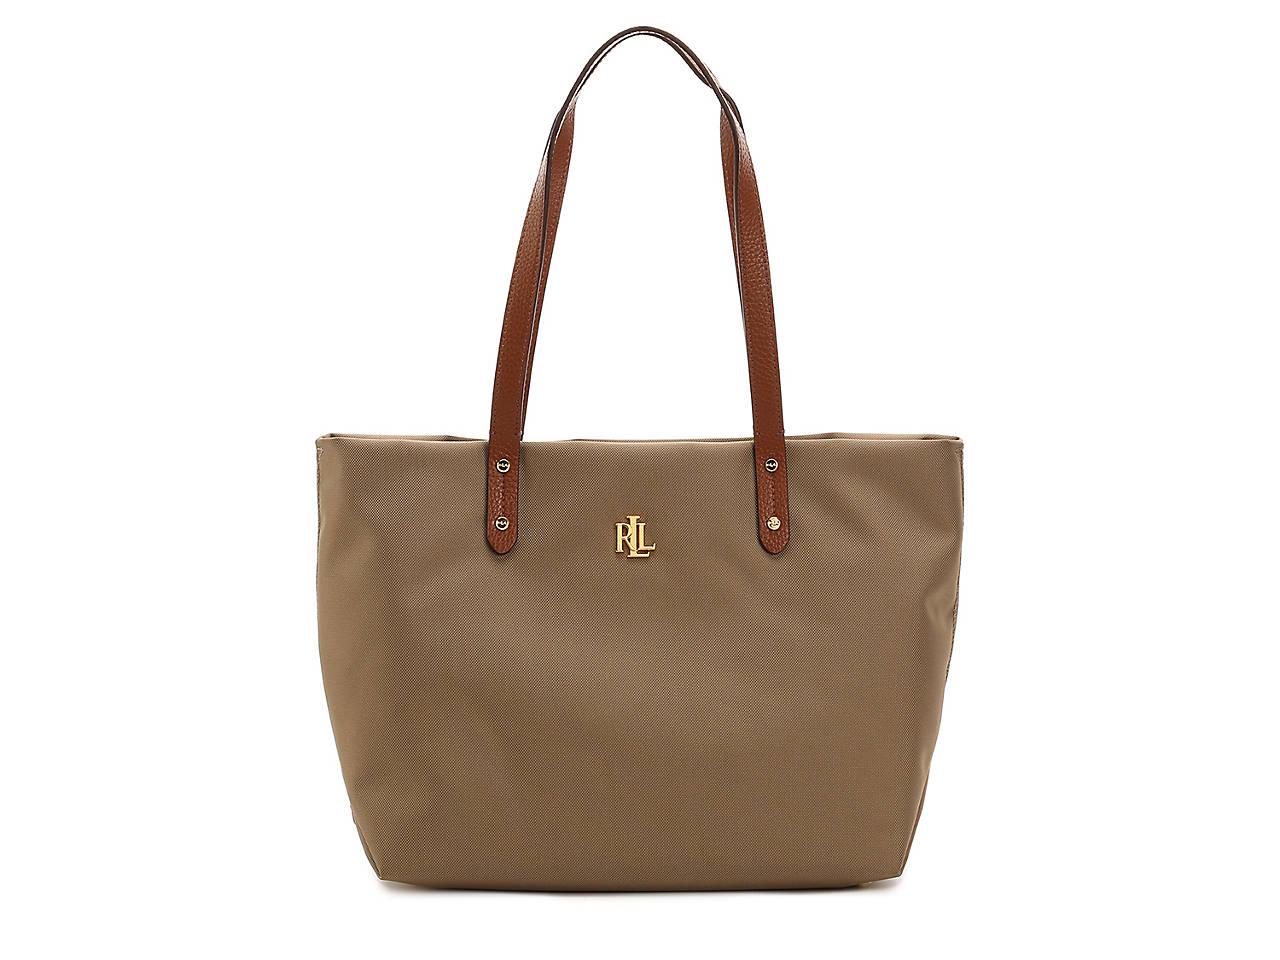 e55ddb23e0ae Lauren Ralph Lauren Bainbridge Tote Women s Handbags   Accessories